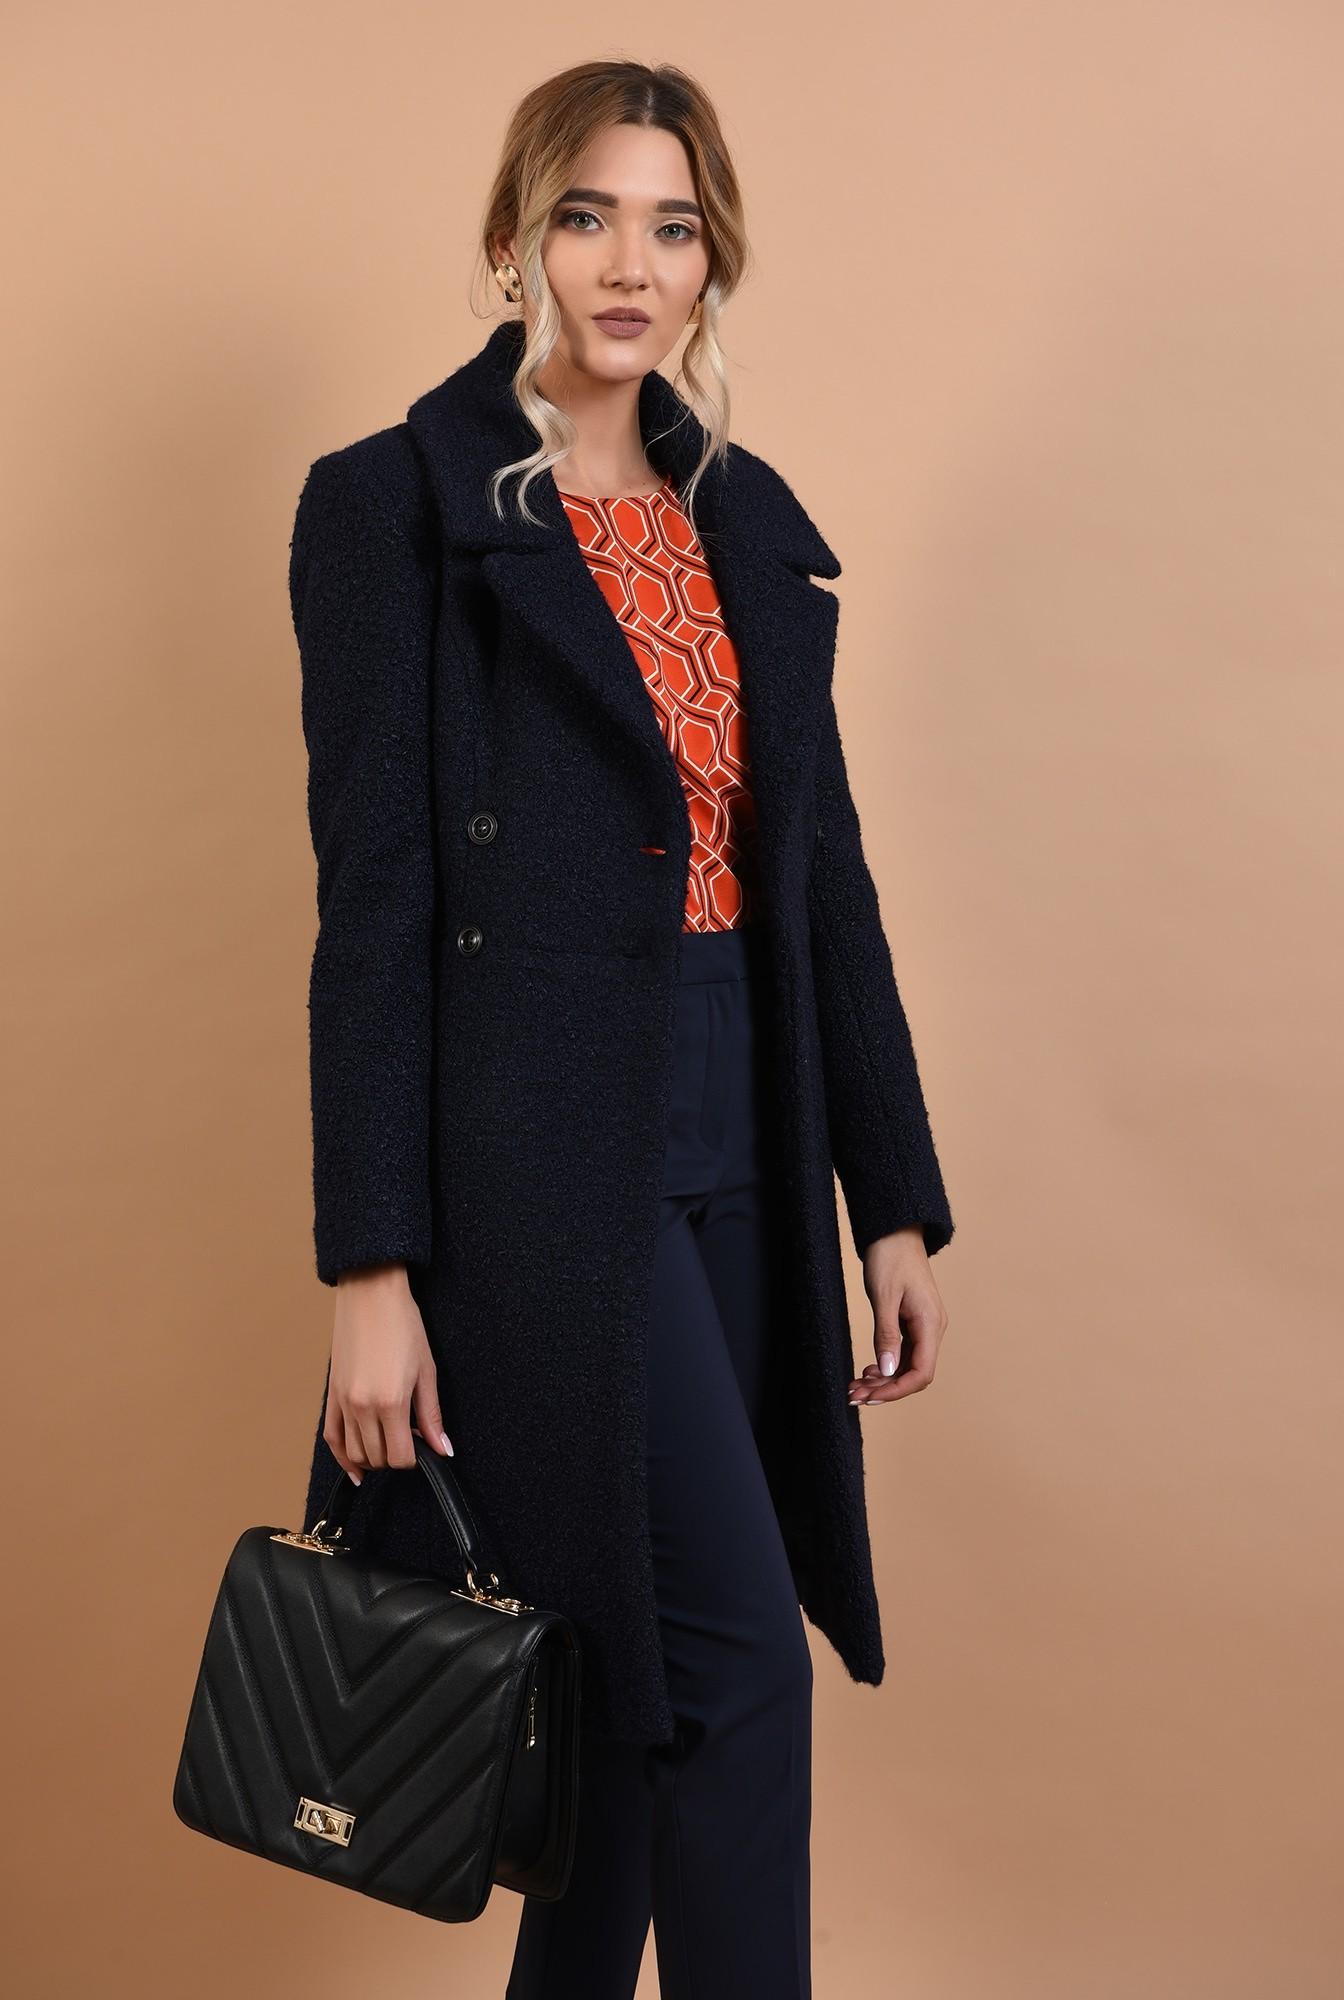 0 - palton bleumarin, cu nasturi, revere crestate, anchior petrecut